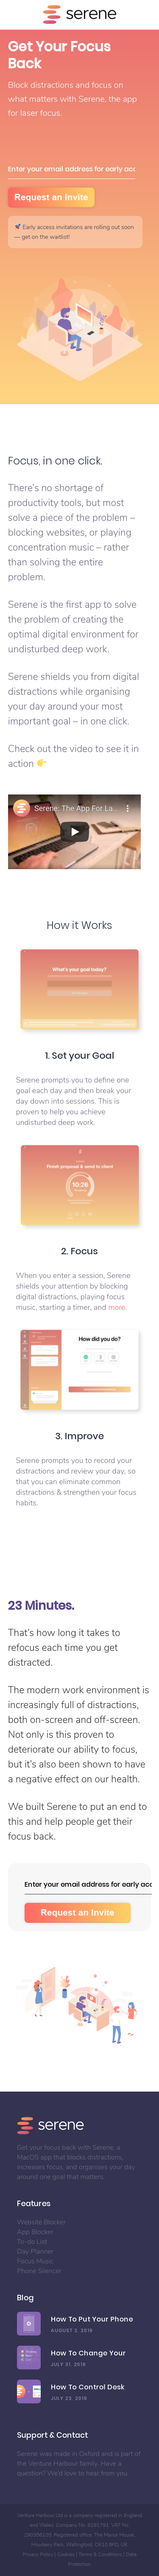 Example of Design for Uncategorized, Mobile Landing Page by sereneapp.com | Mobile Landing Page Design